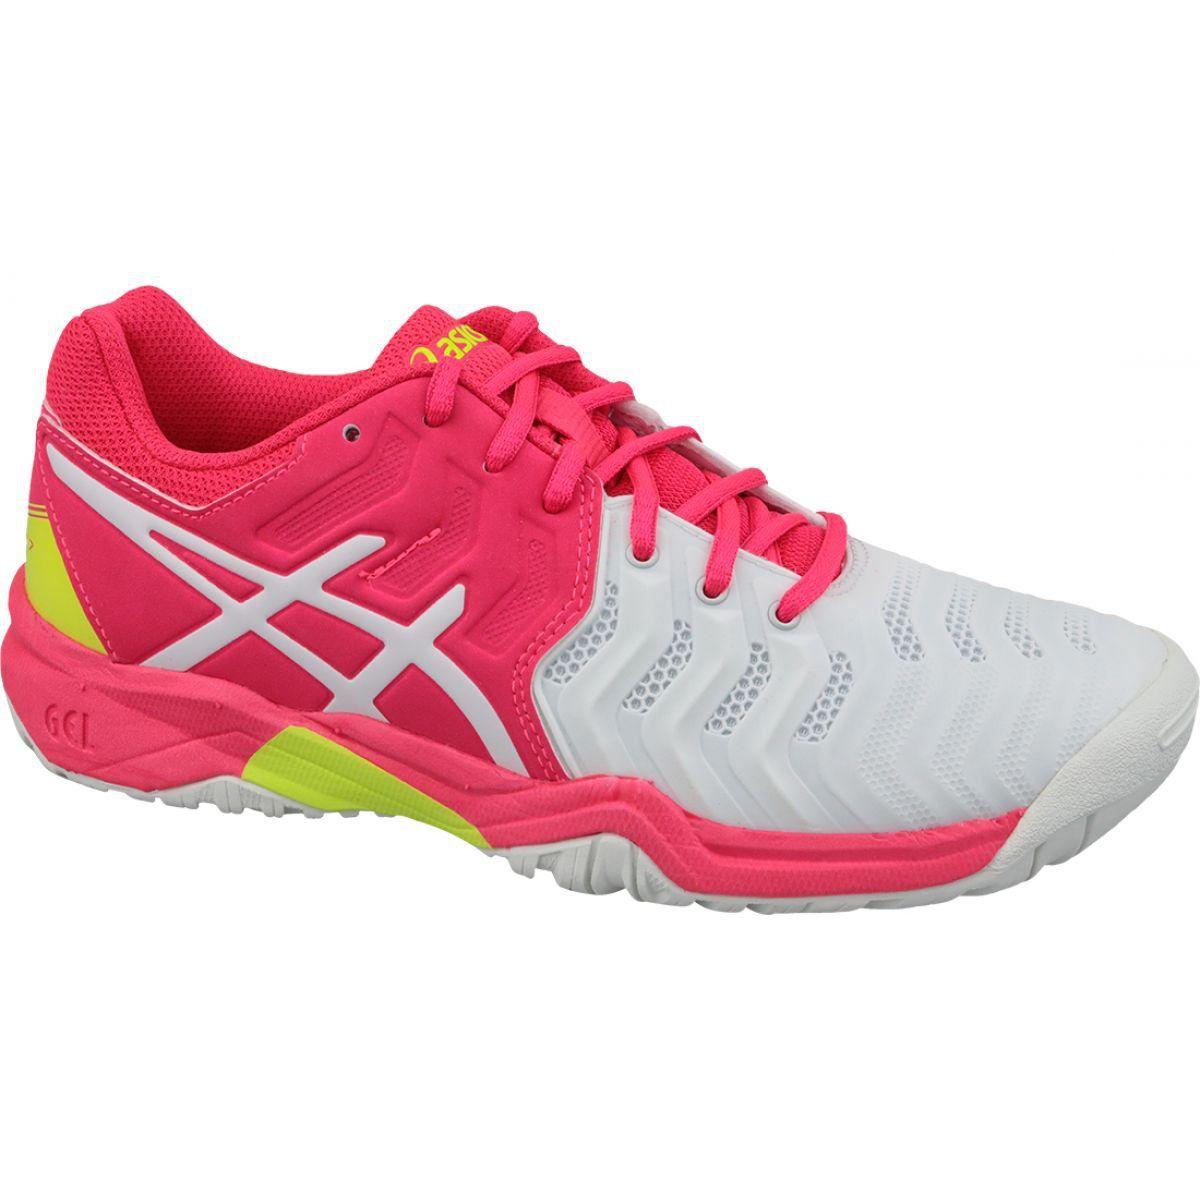 Tenis Ziemny Sport Asics Buty Tenisowe Asics Gel Resolution 7 Gs Jr C700y 116 Asics Shoes Tennis Shoes